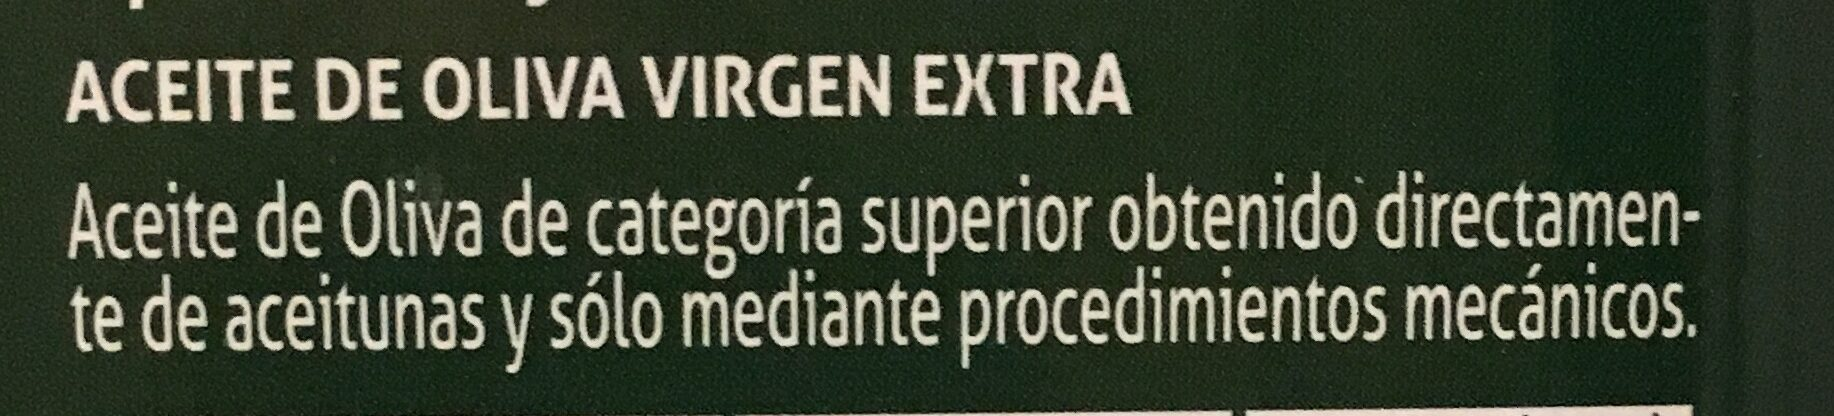 Aceite De Oliva Virgen Extra Carbonell Lata 5L - Ingrédients - fr